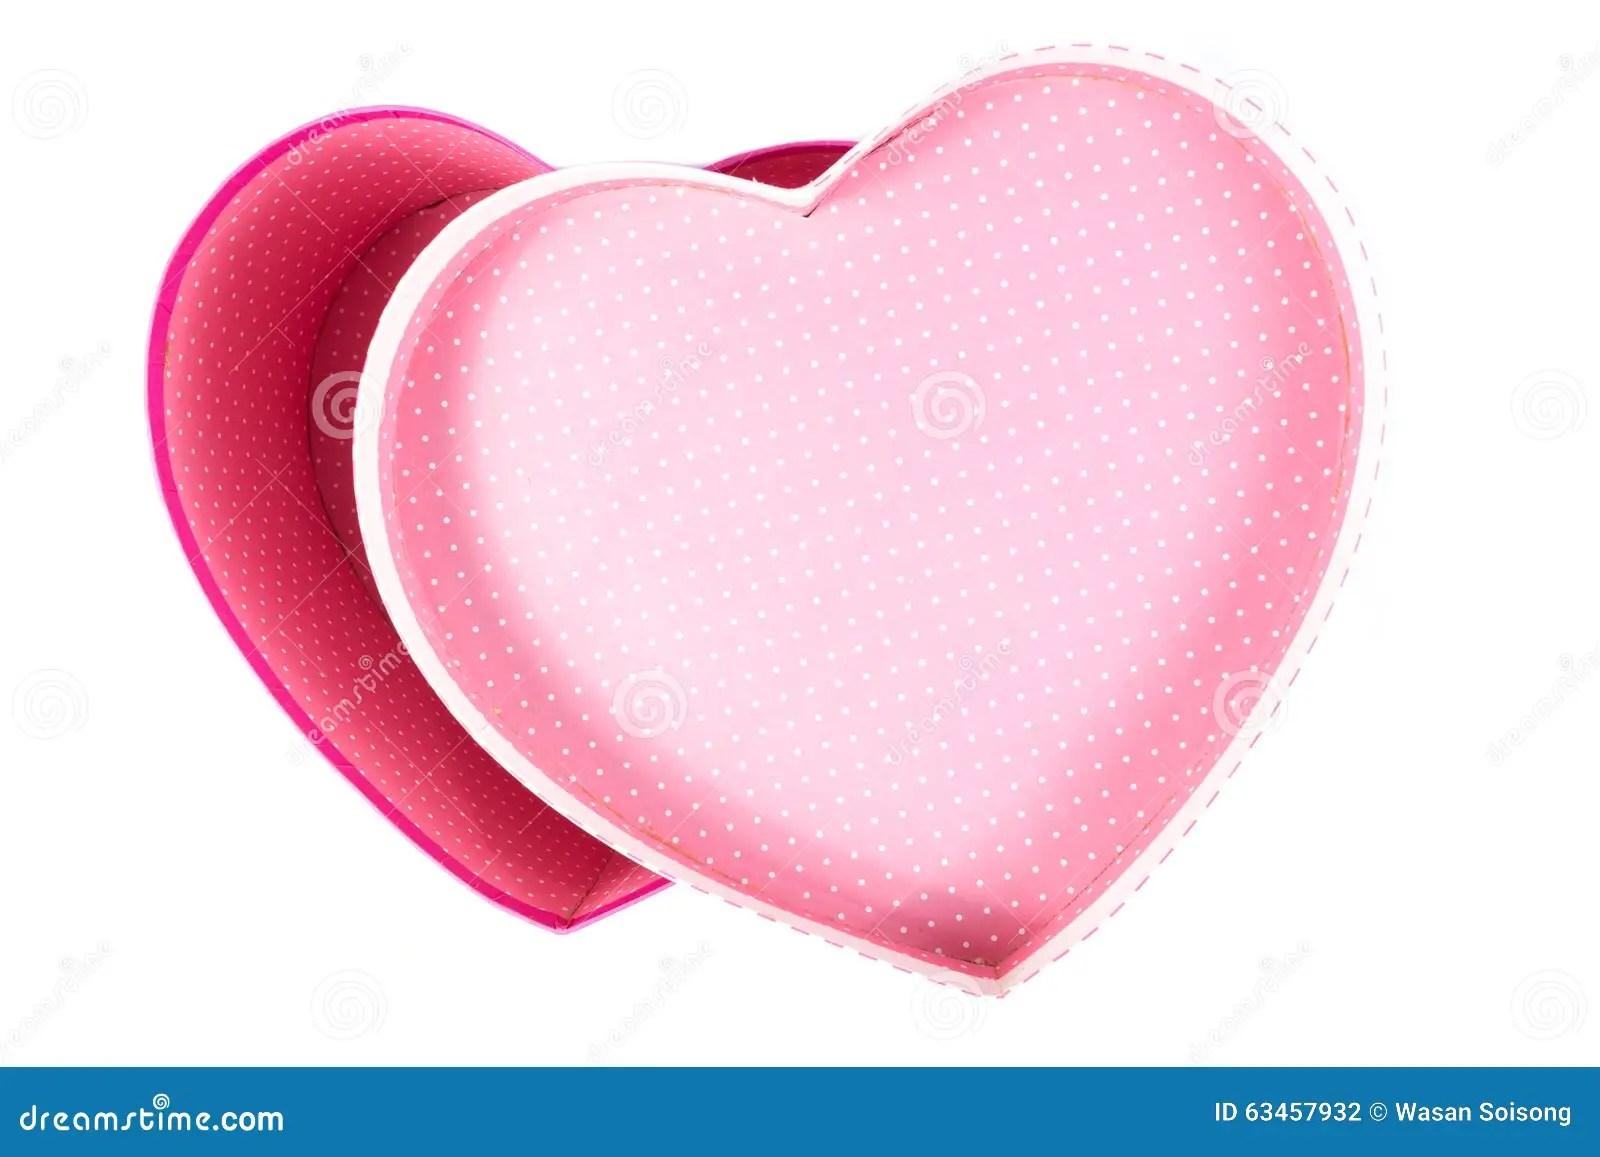 Emptyblank Heartlove Shape Gift Box Inside Top View